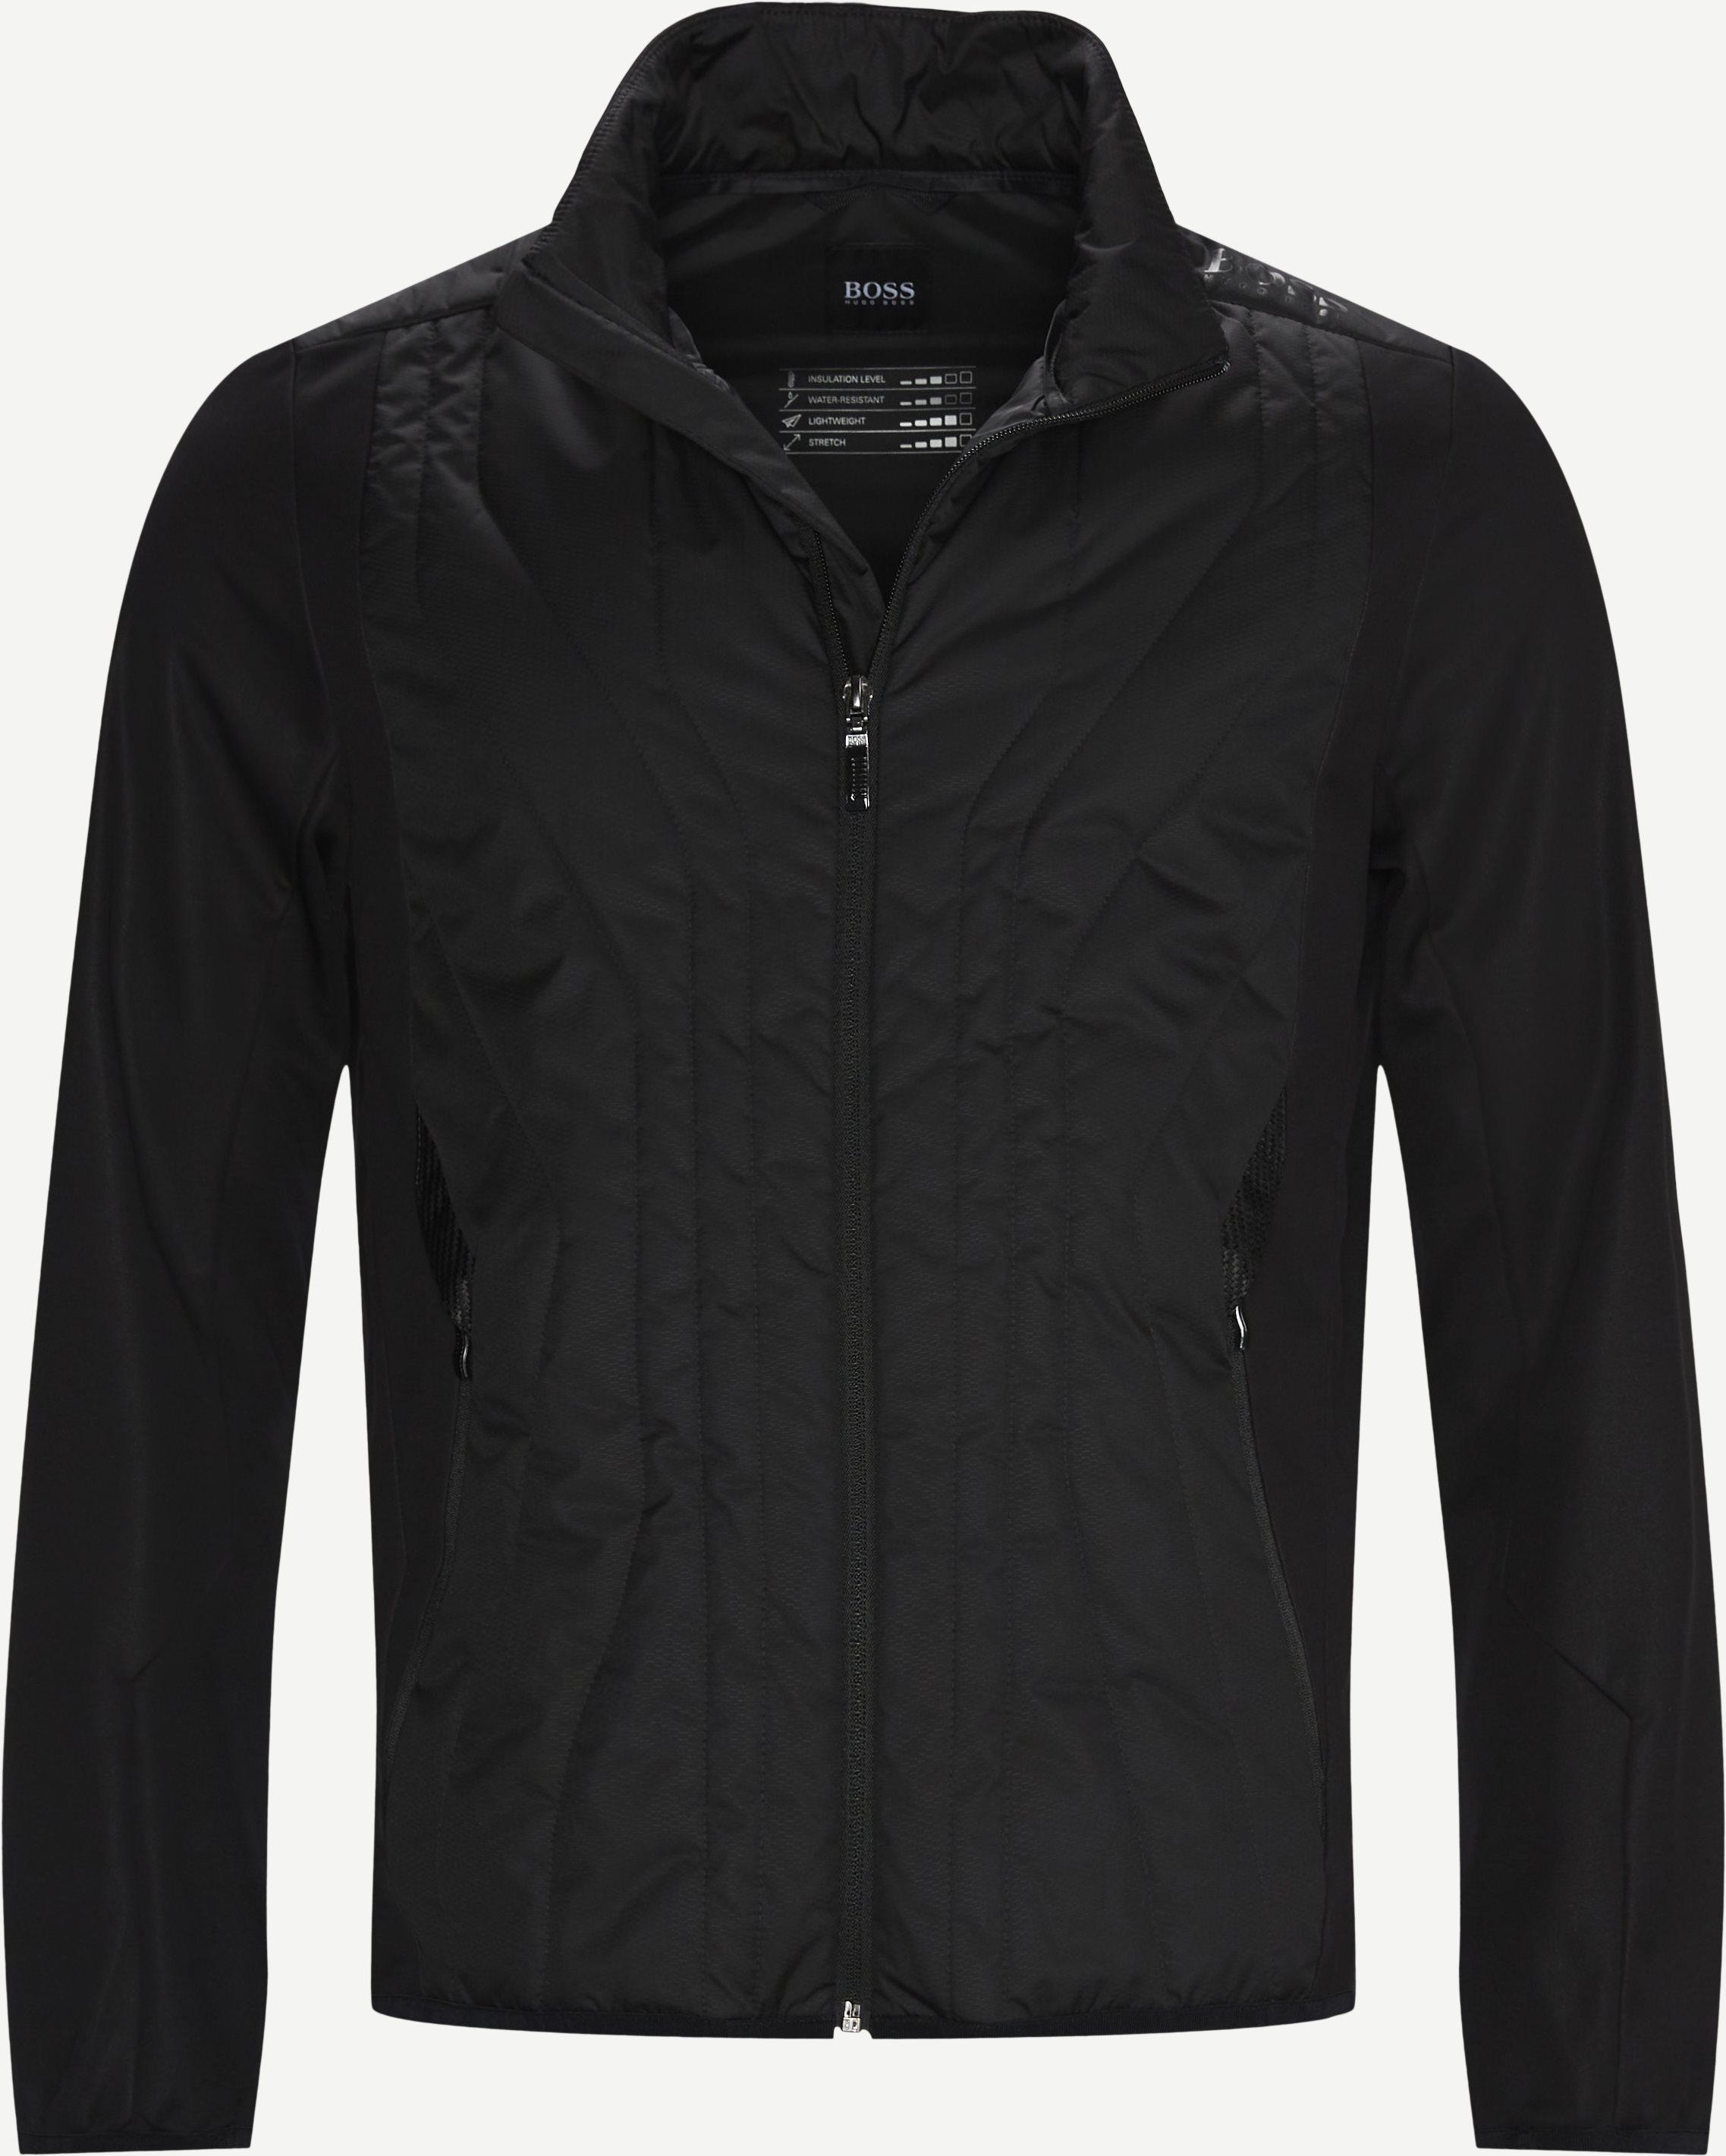 Sweatshirts - Regular - Black